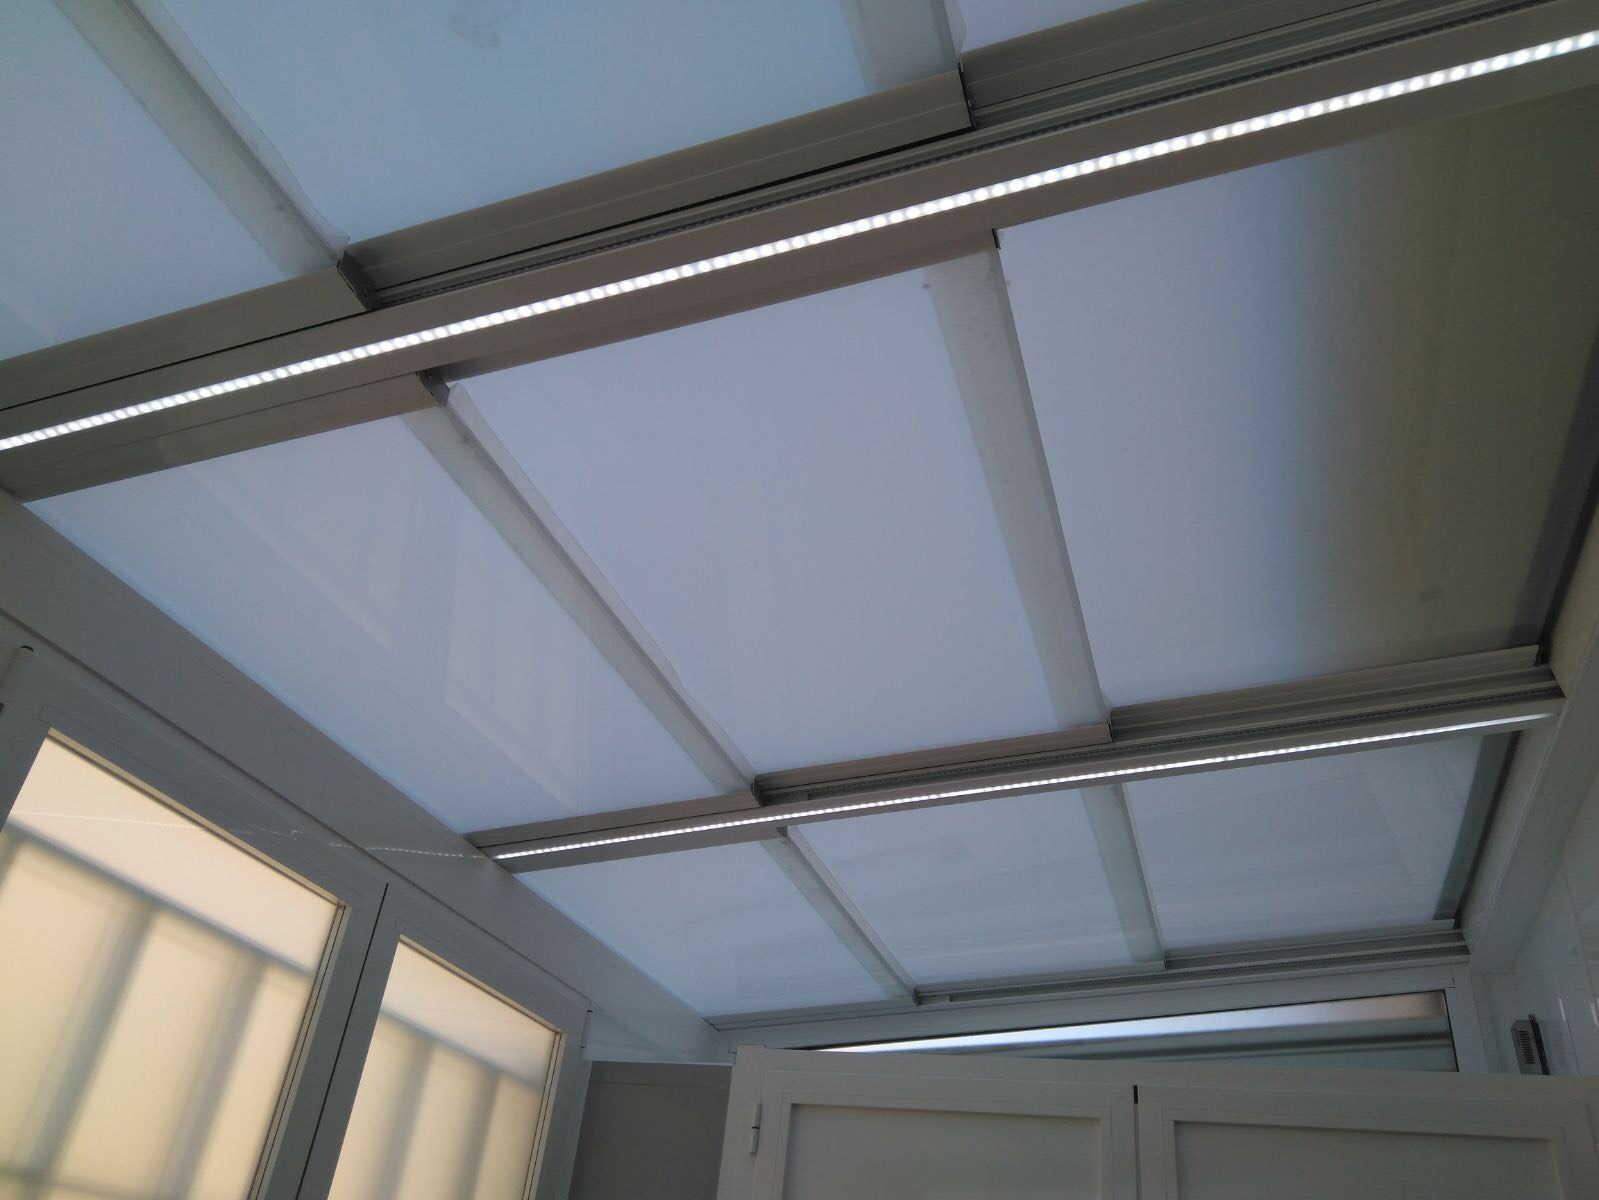 Instalaci n techo m vil de cristal con luces interiores for Luces interiores